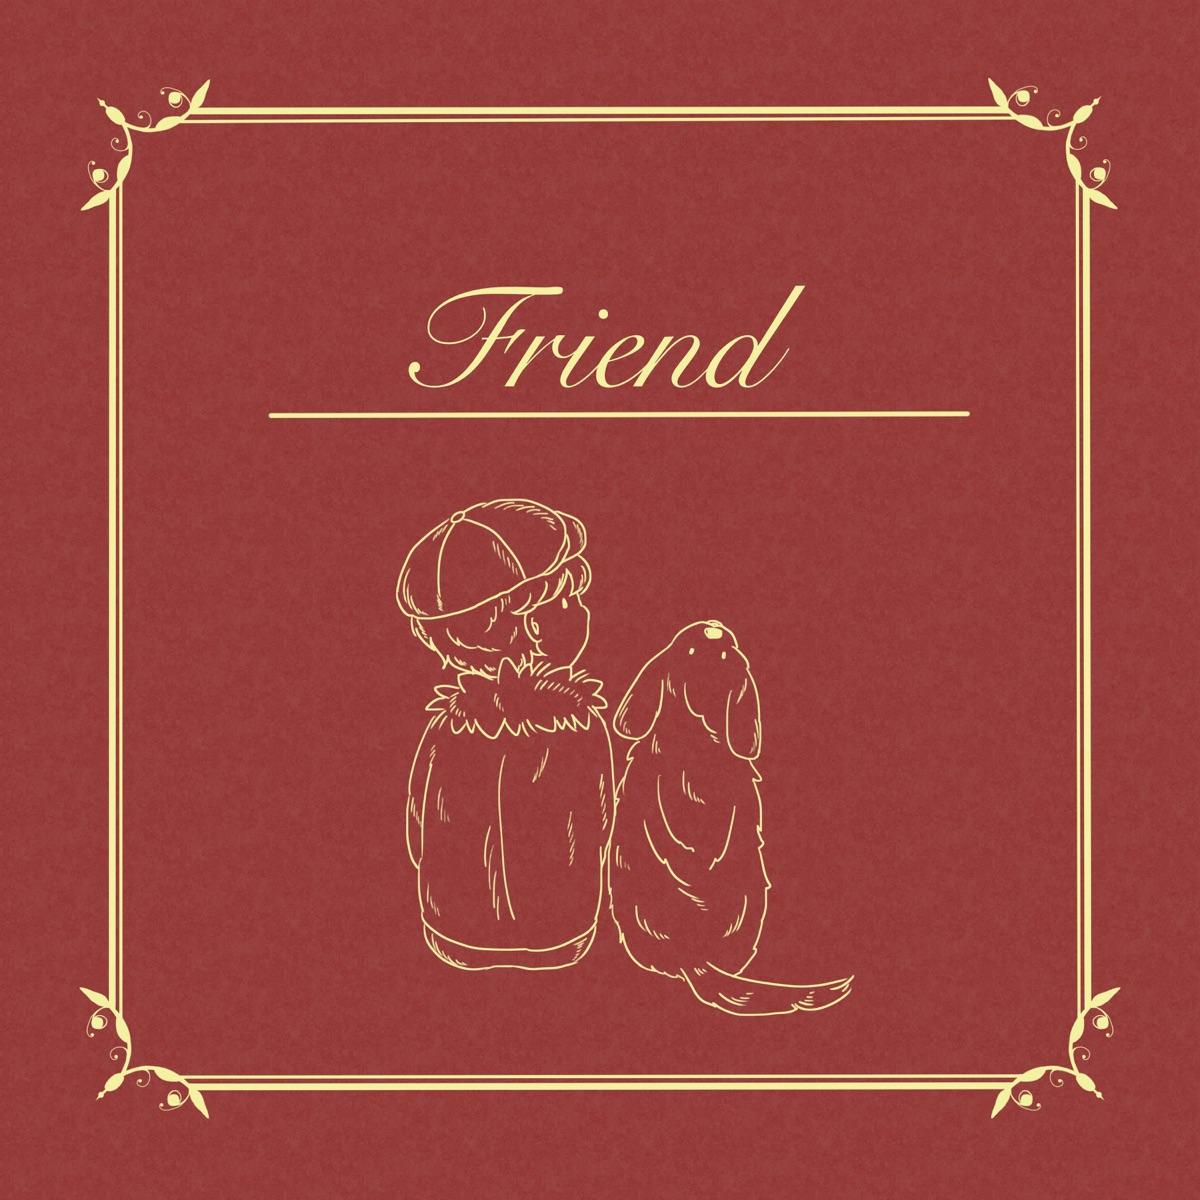 『HoneyComeBear - Friend』収録の『Friend』ジャケット